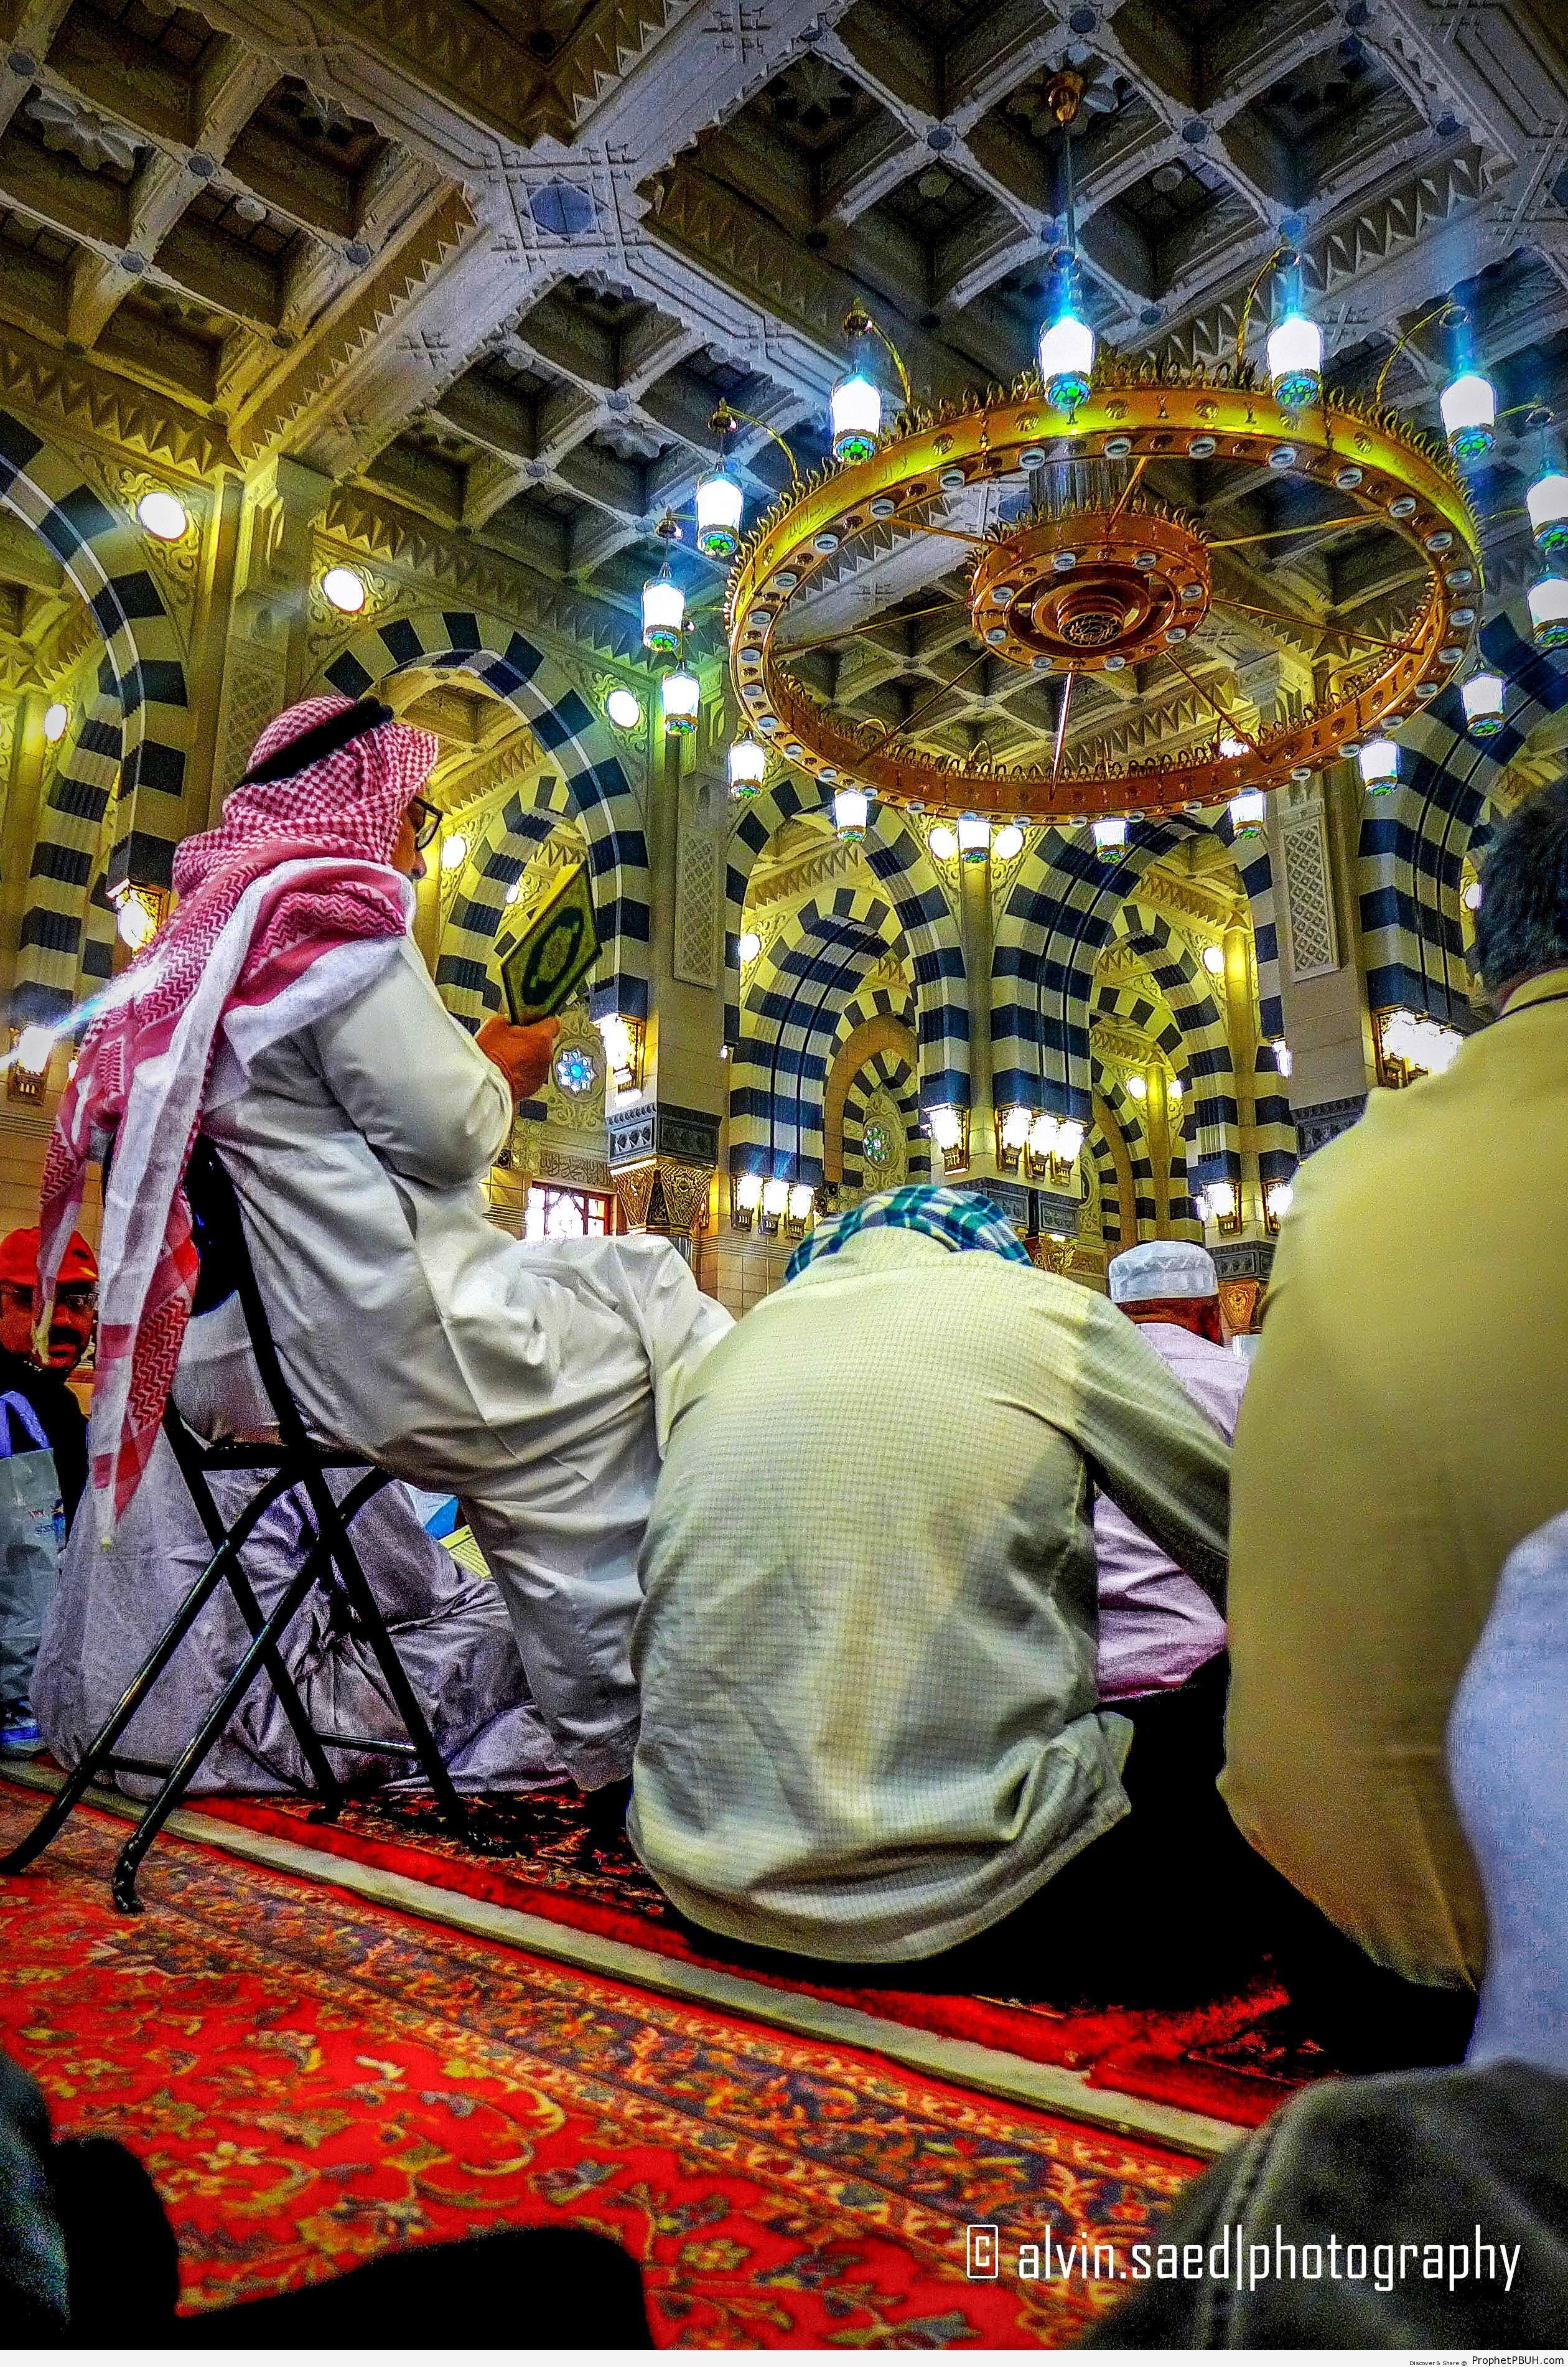 Inside al-Masjid an-Nabawi in Madinah, Saudi Arabia - Al-Masjid an-Nabawi (The Prophets Mosque) in Madinah, Saudi Arabia -Picture